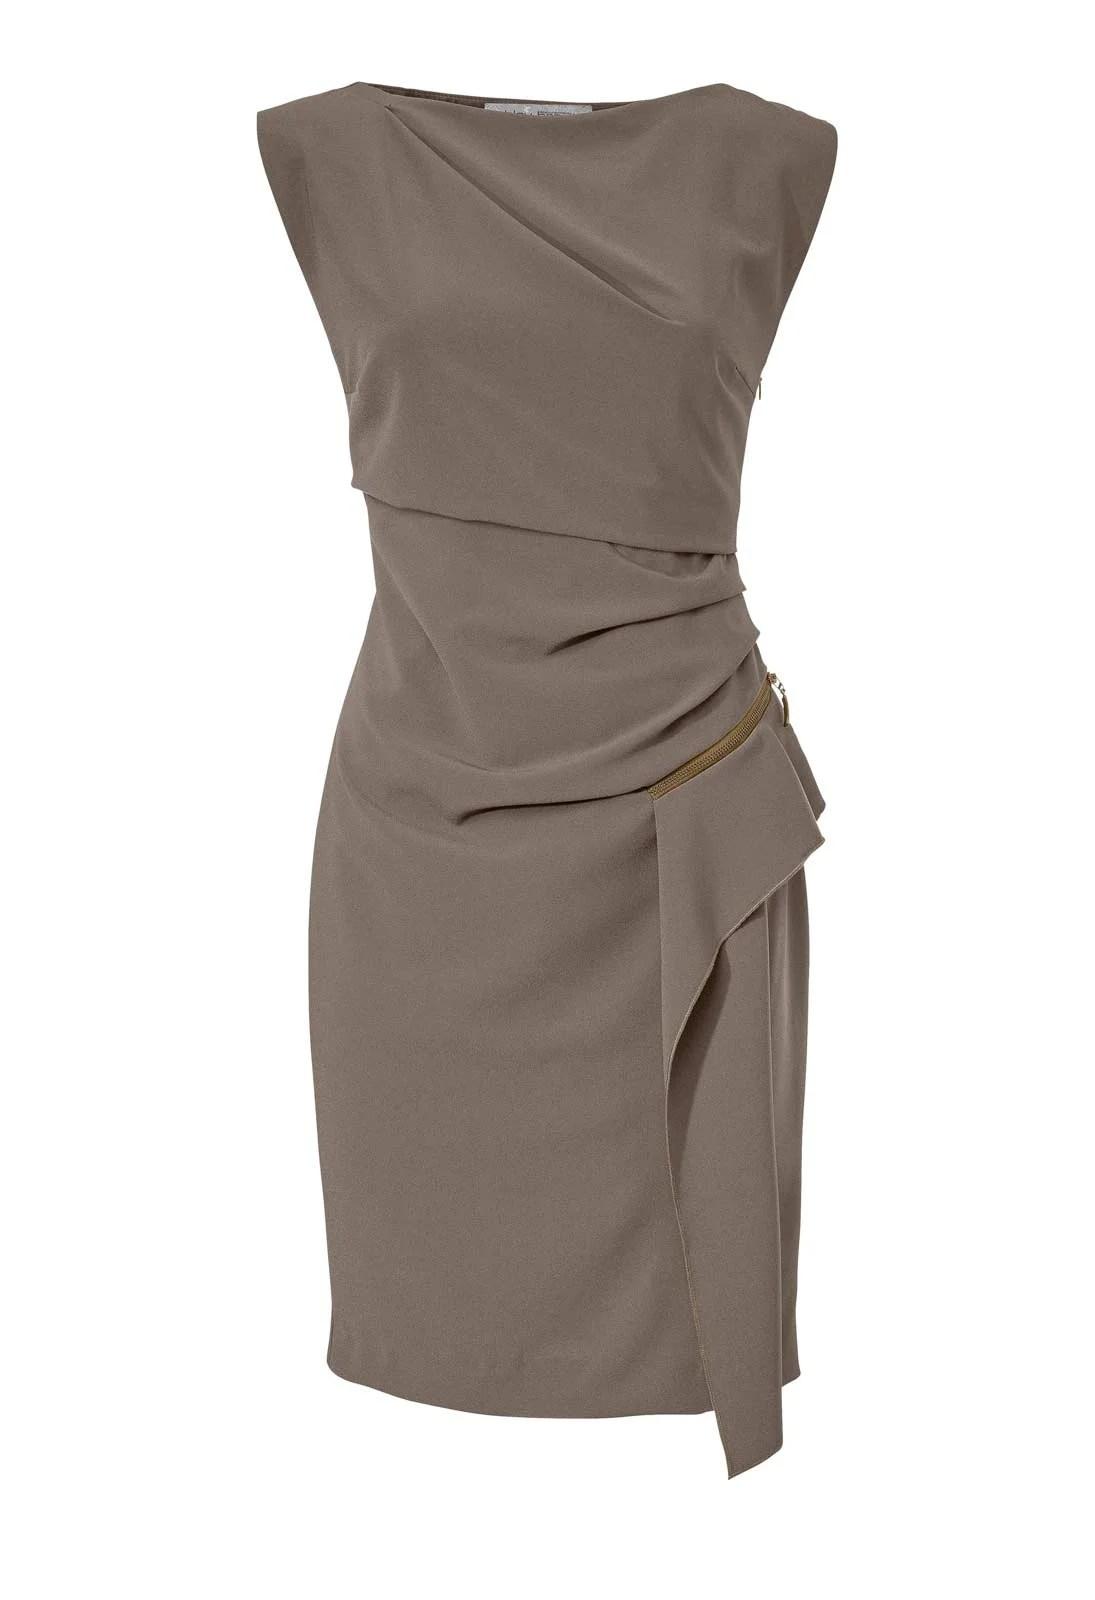 134.853 ASHLEY BROOKE Damen Designer-Etuikleid Taupe